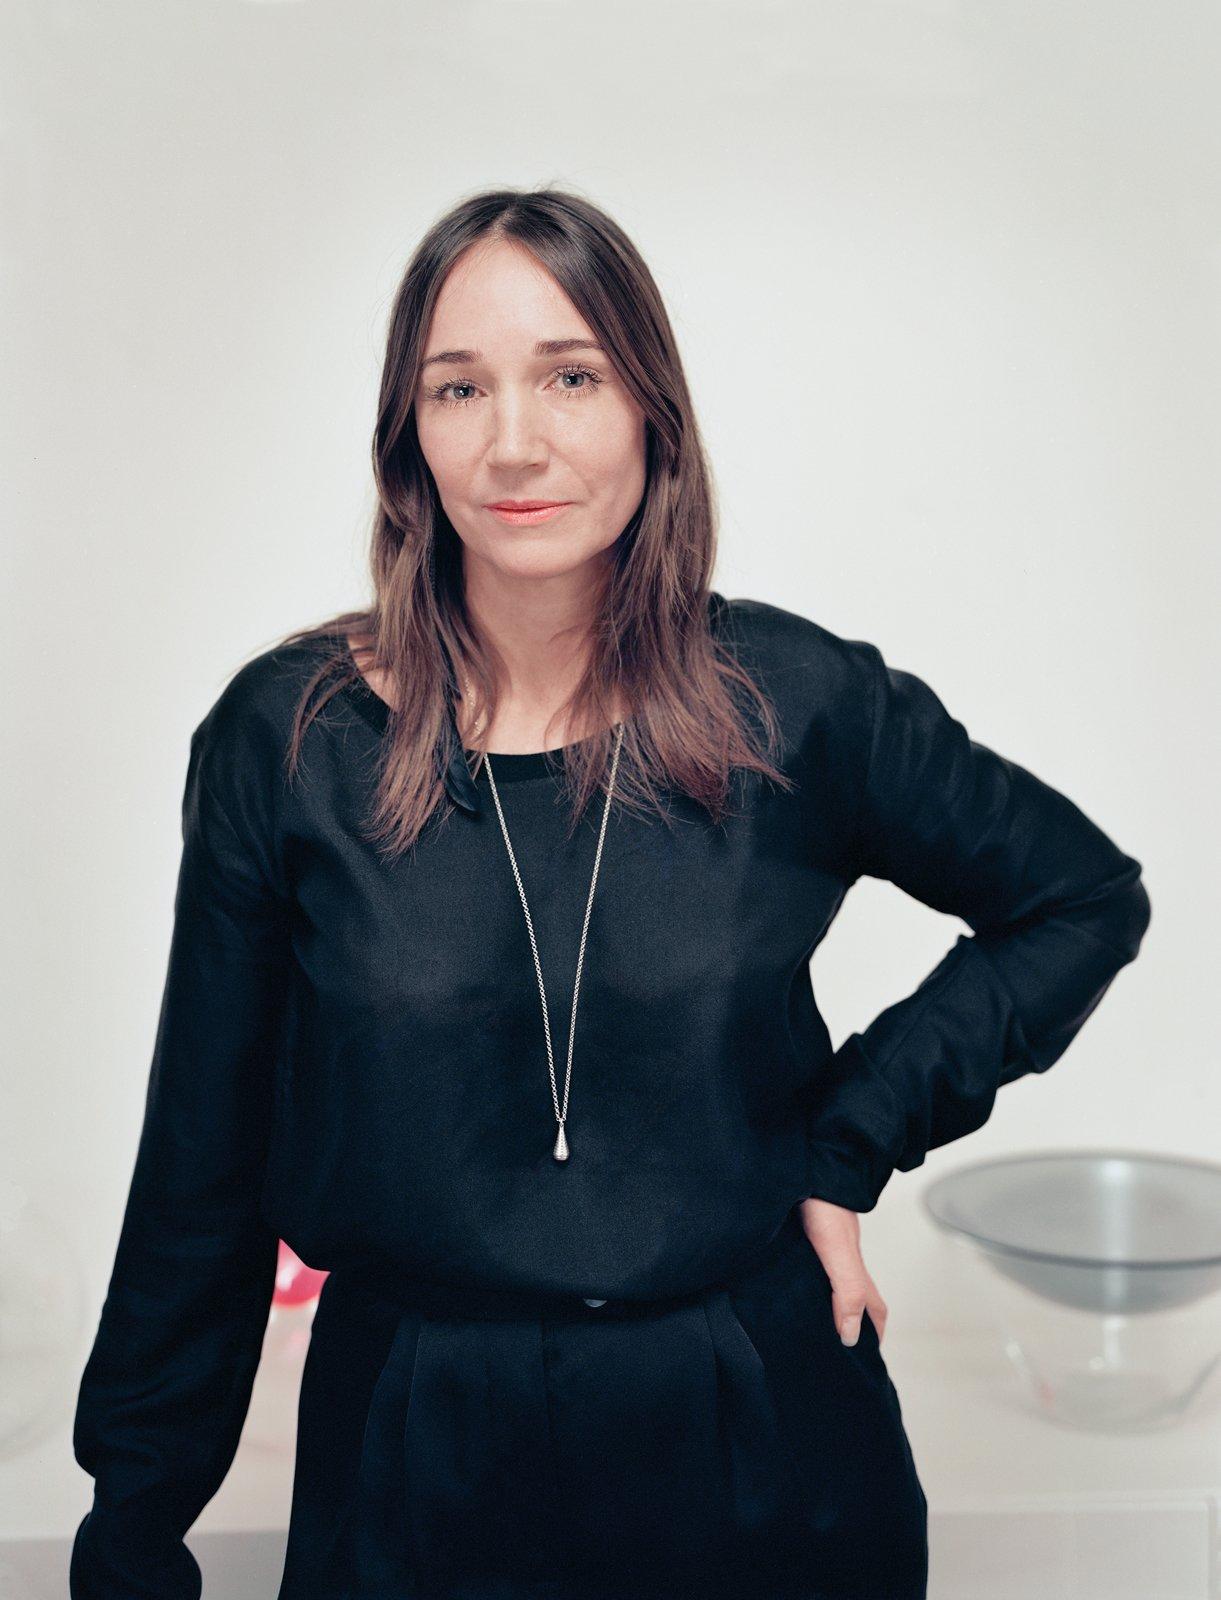 dw 003  Photo 1 of 9 in Swedish Designer Focus: Monica Förster